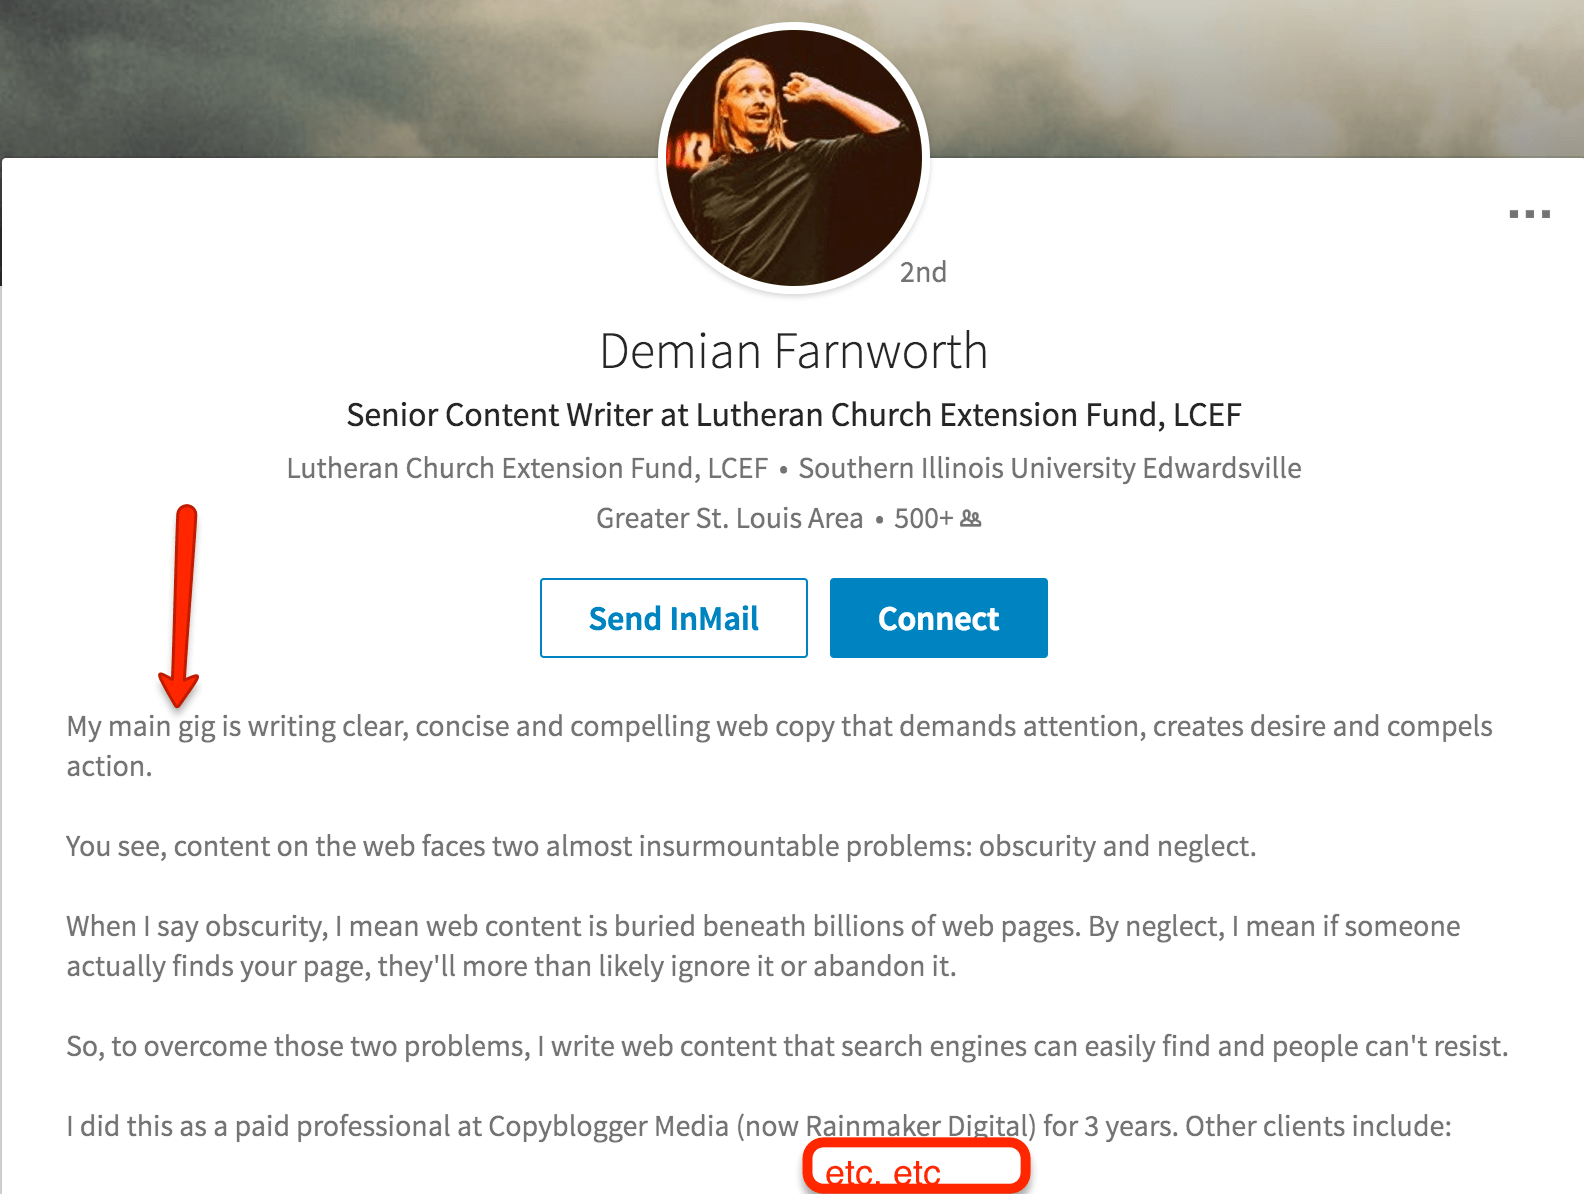 demian farnworth on LinkedIn